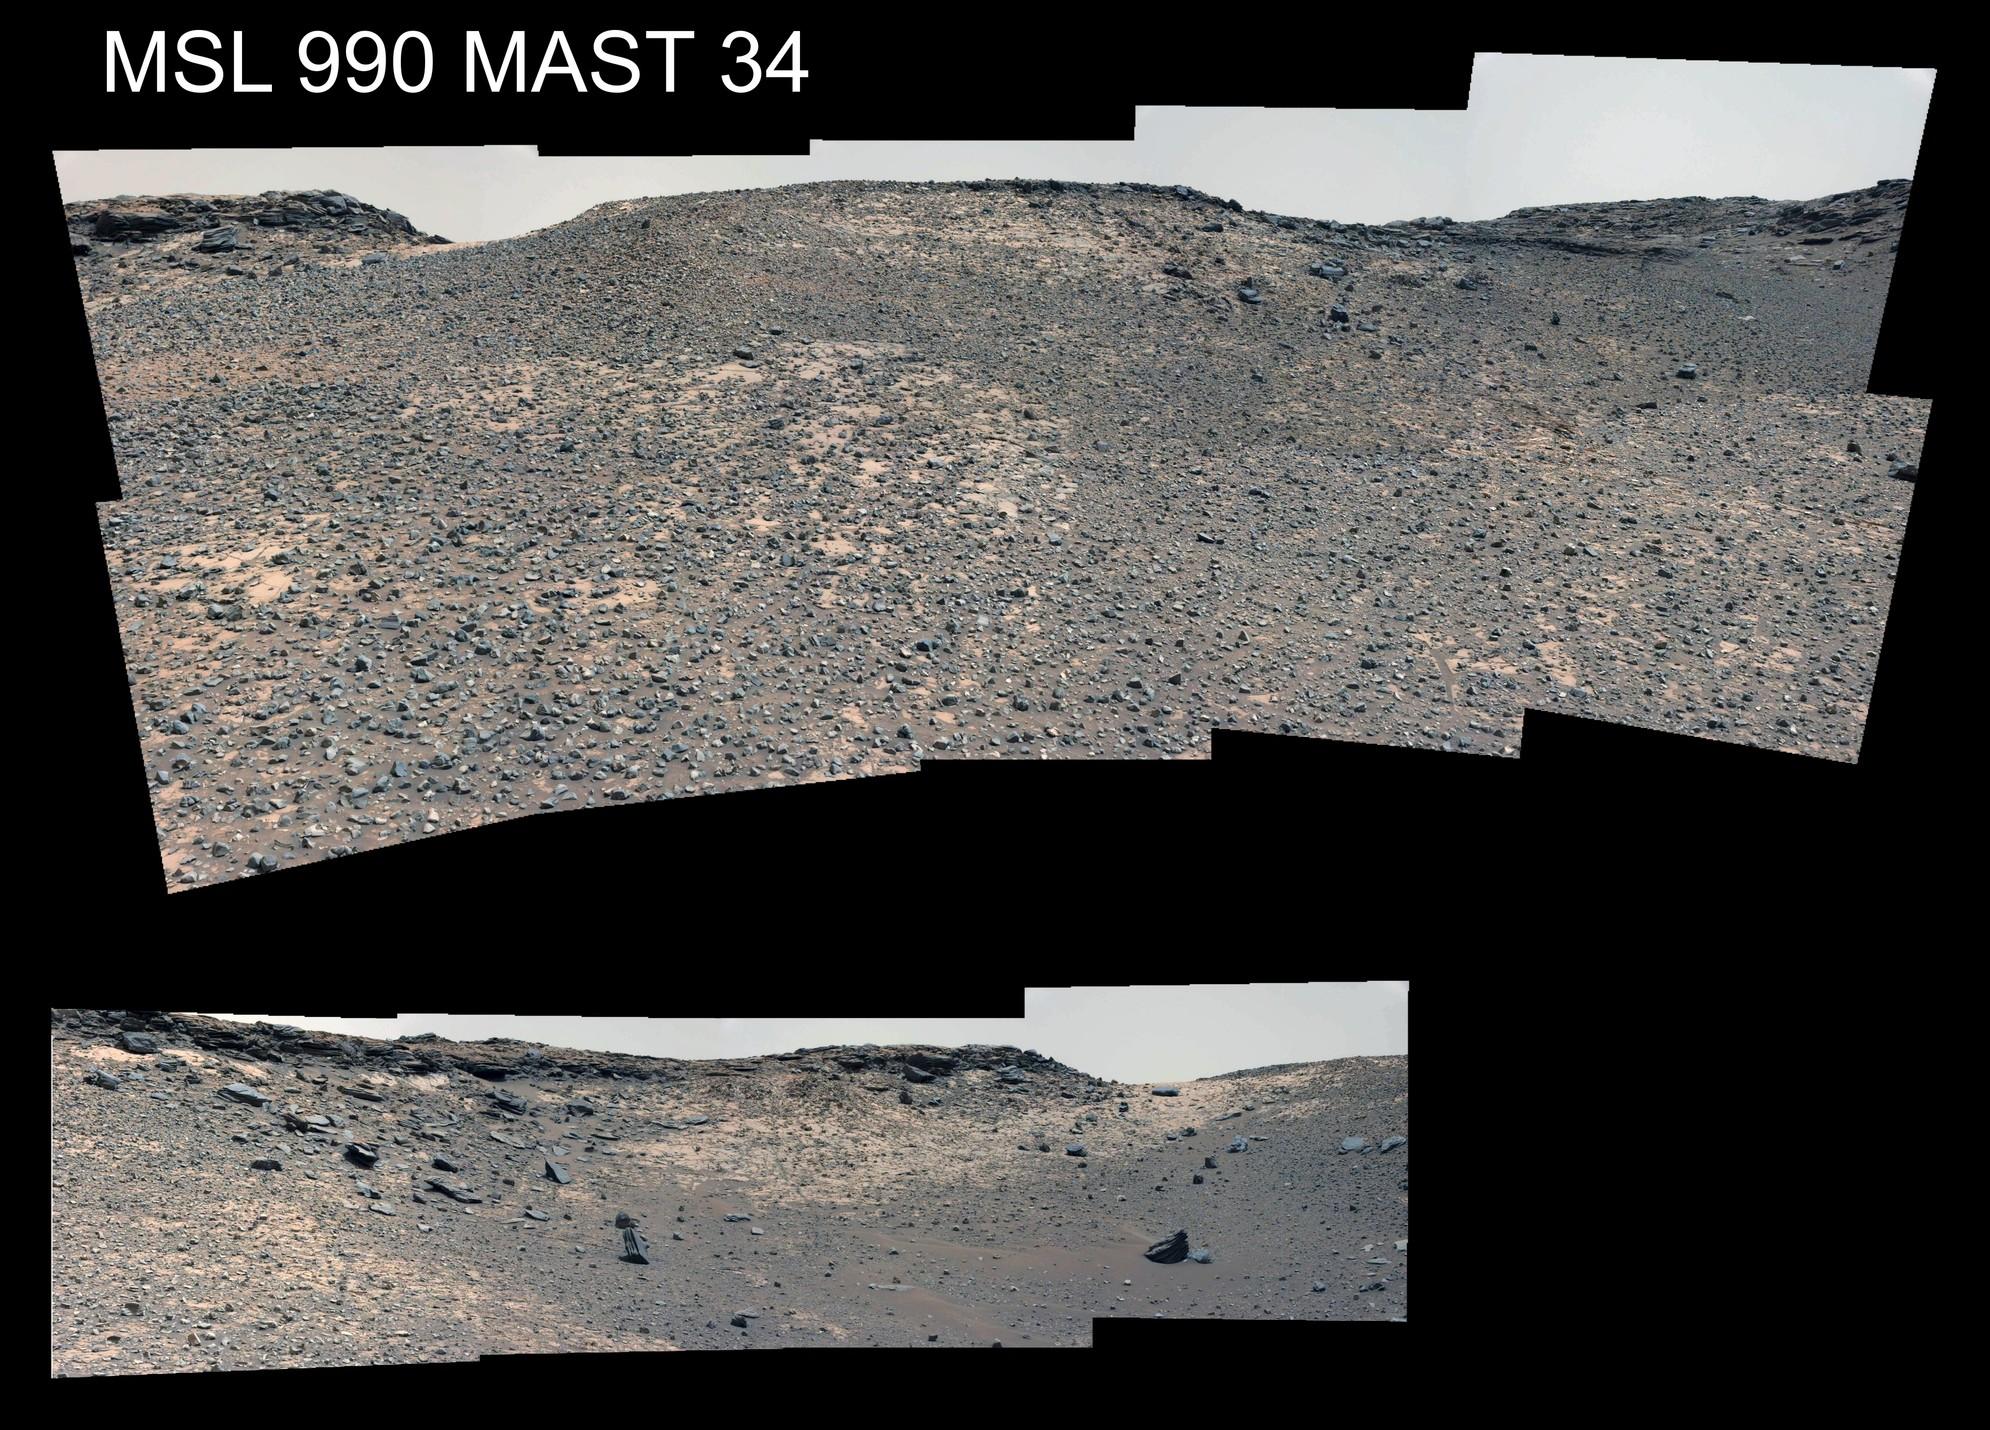 MSL 990 MAST 34